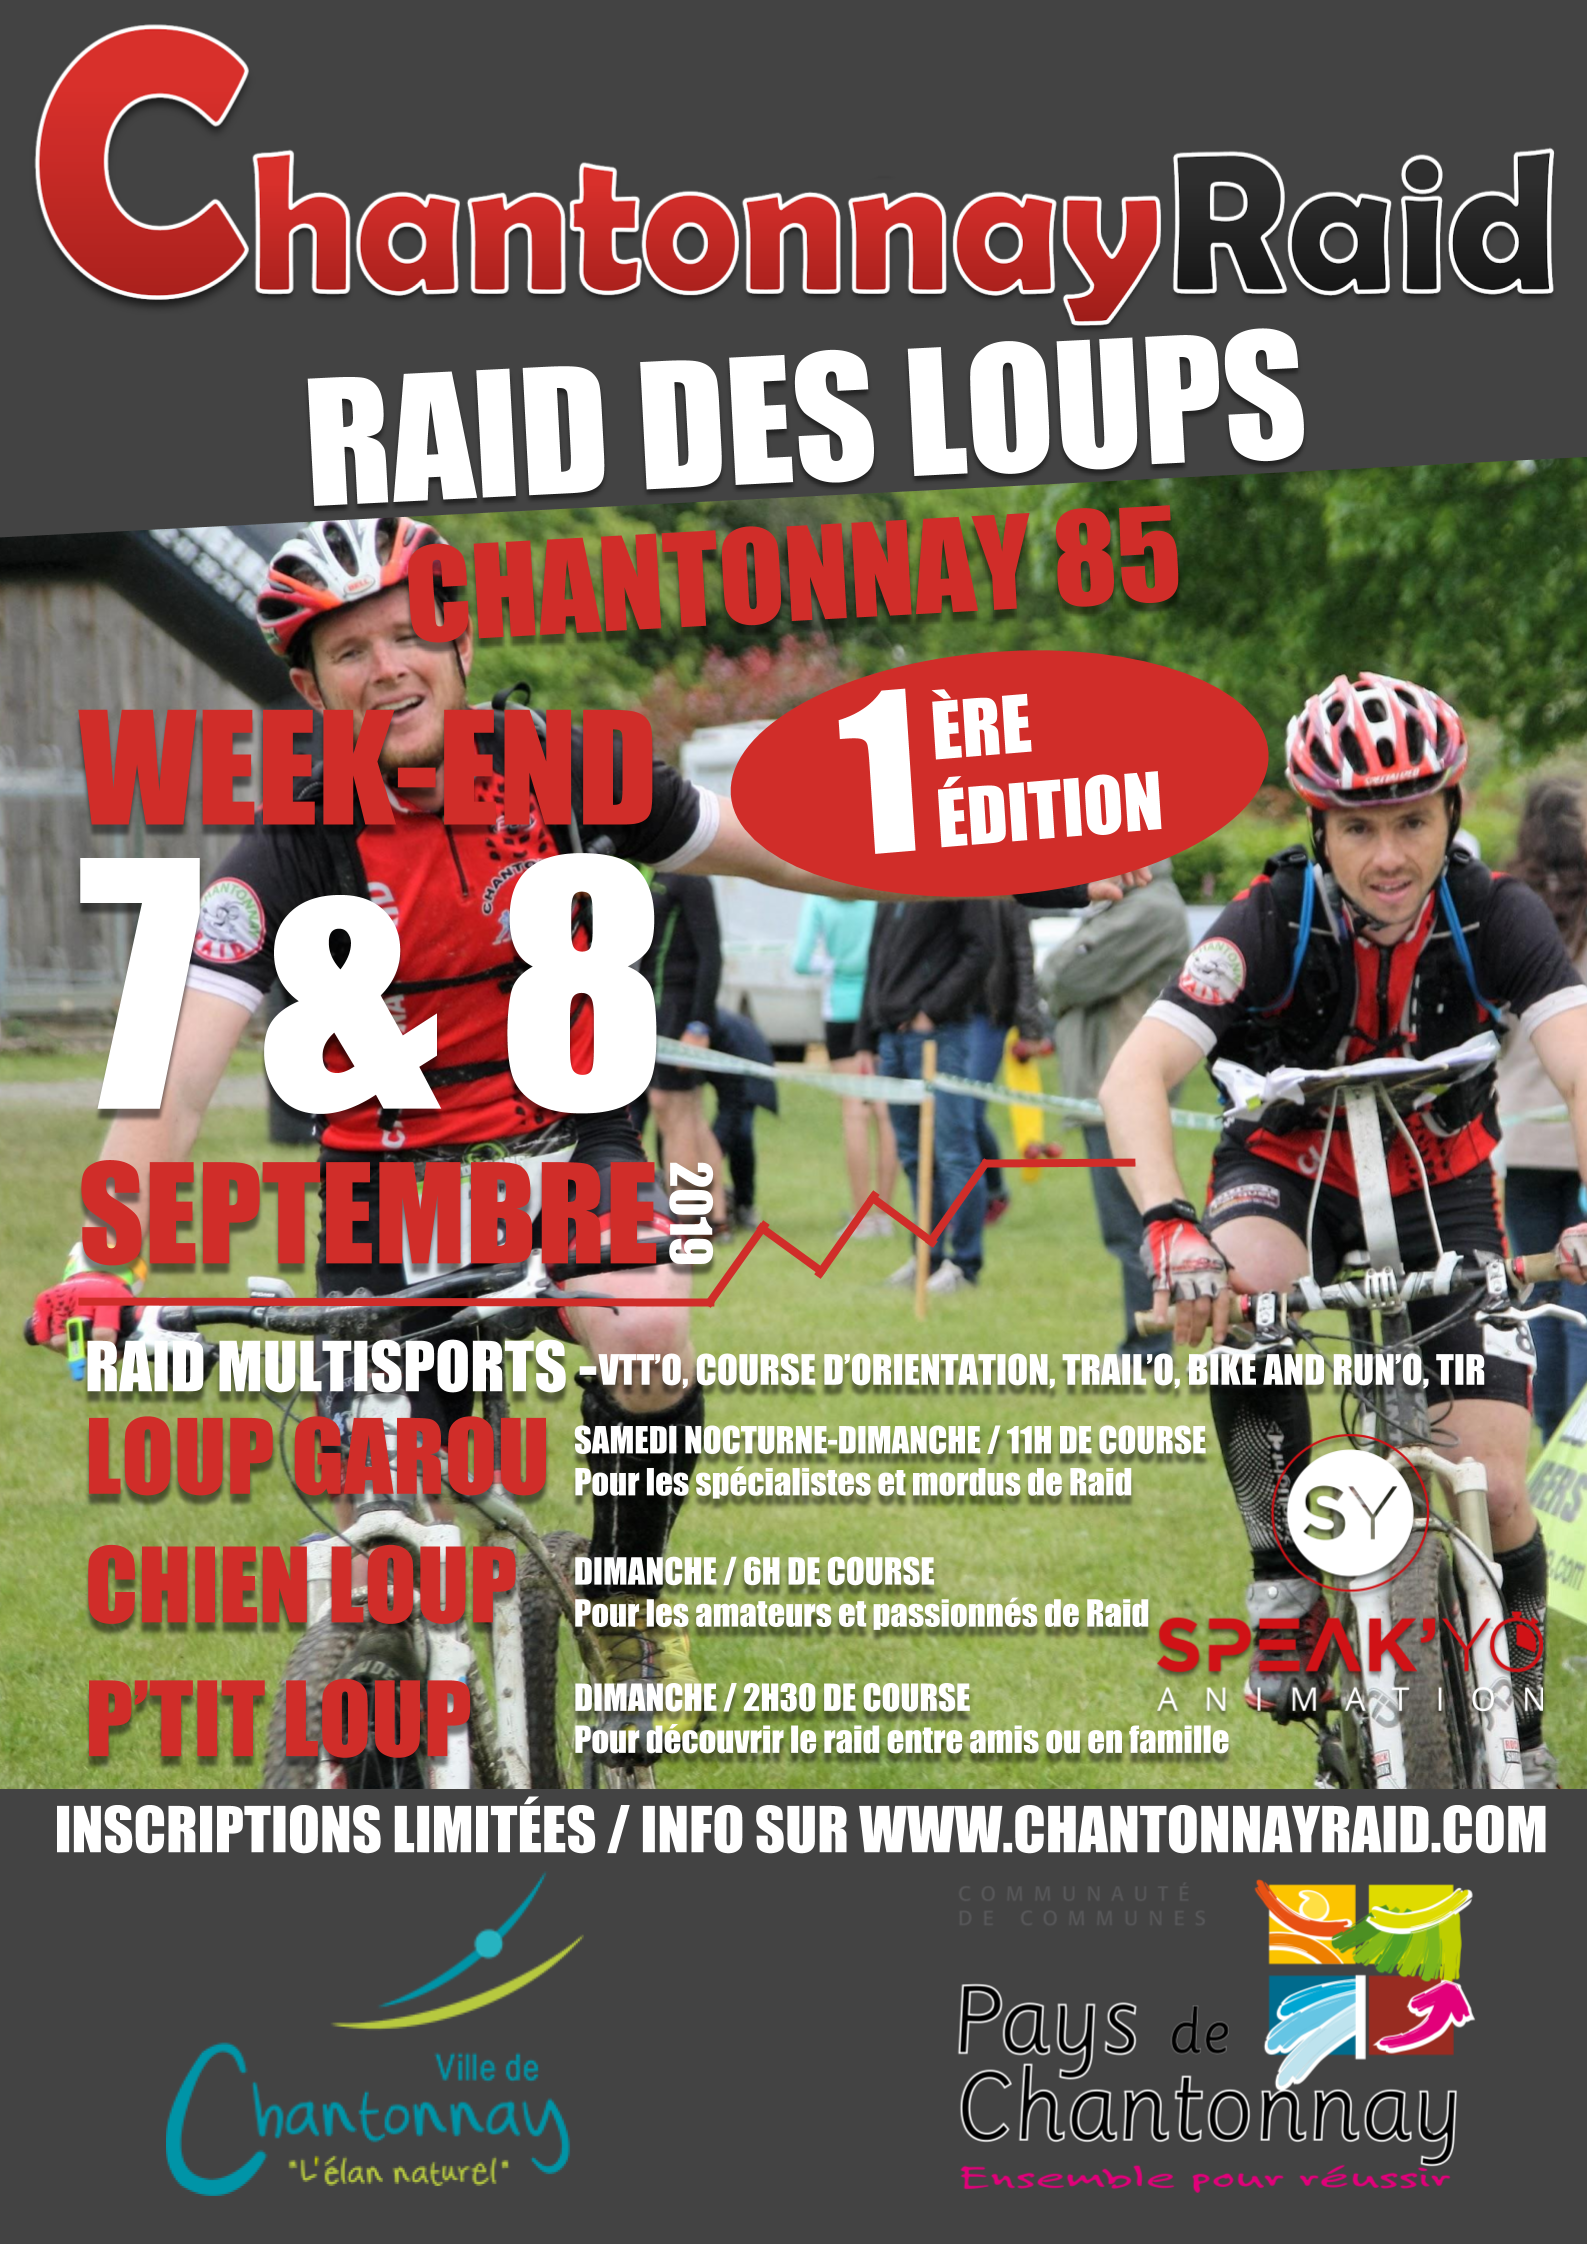 Calendrier Raid Multisport 2019.Raid Des Loups 7 Et 8 Septembre 2019 Raid Multisports